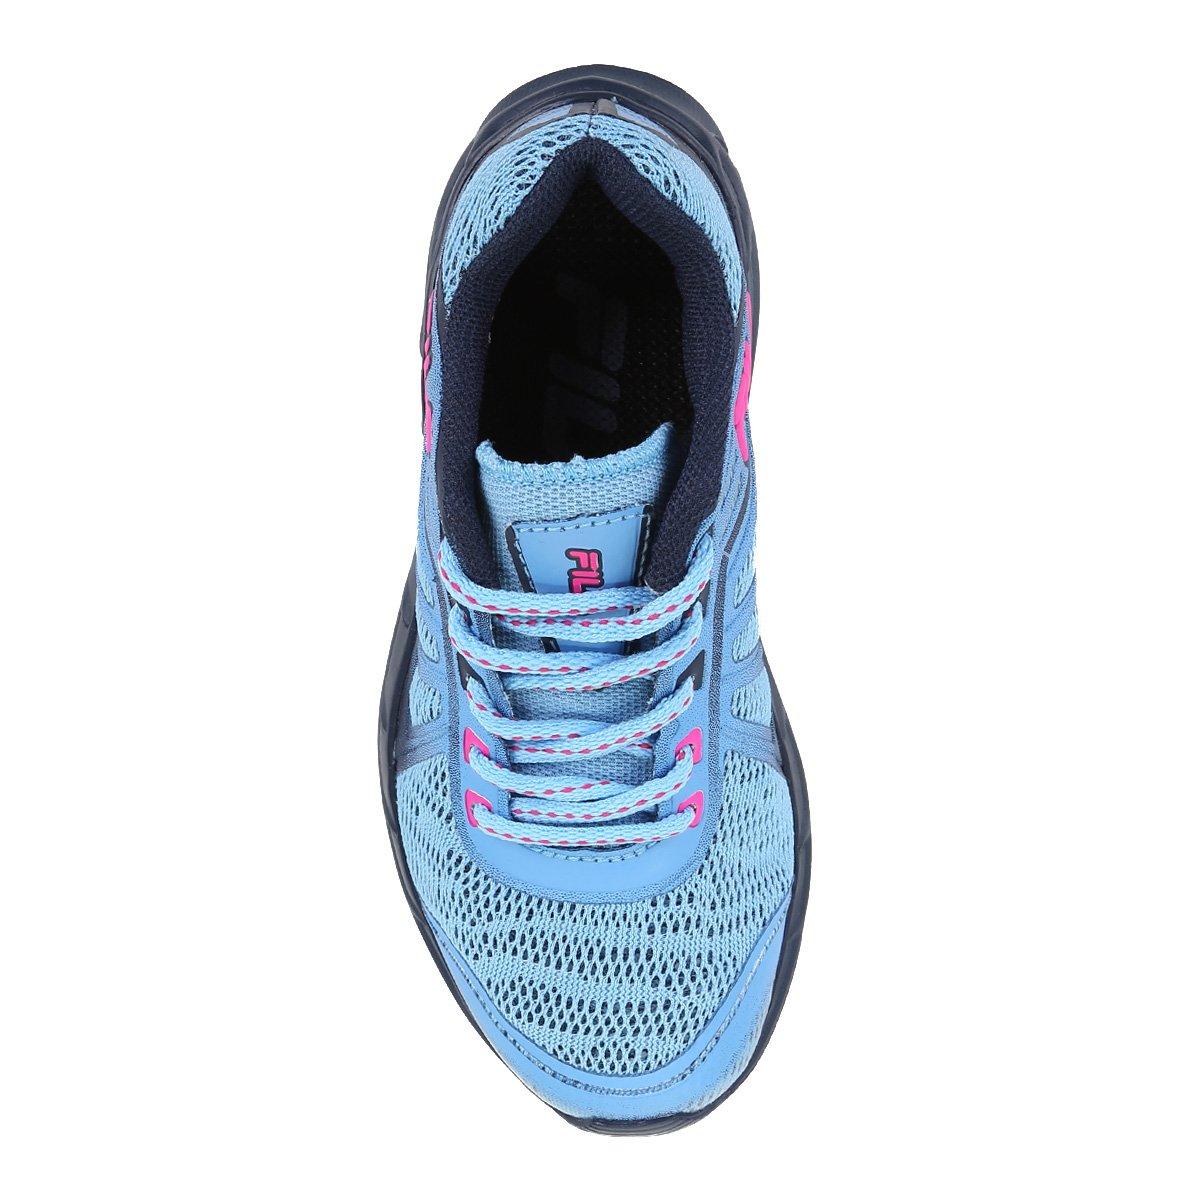 9026c23954 Tênis Infantil Fila Spirit 2.0 Masculino - Tam: 35 - Shopping TudoAzul